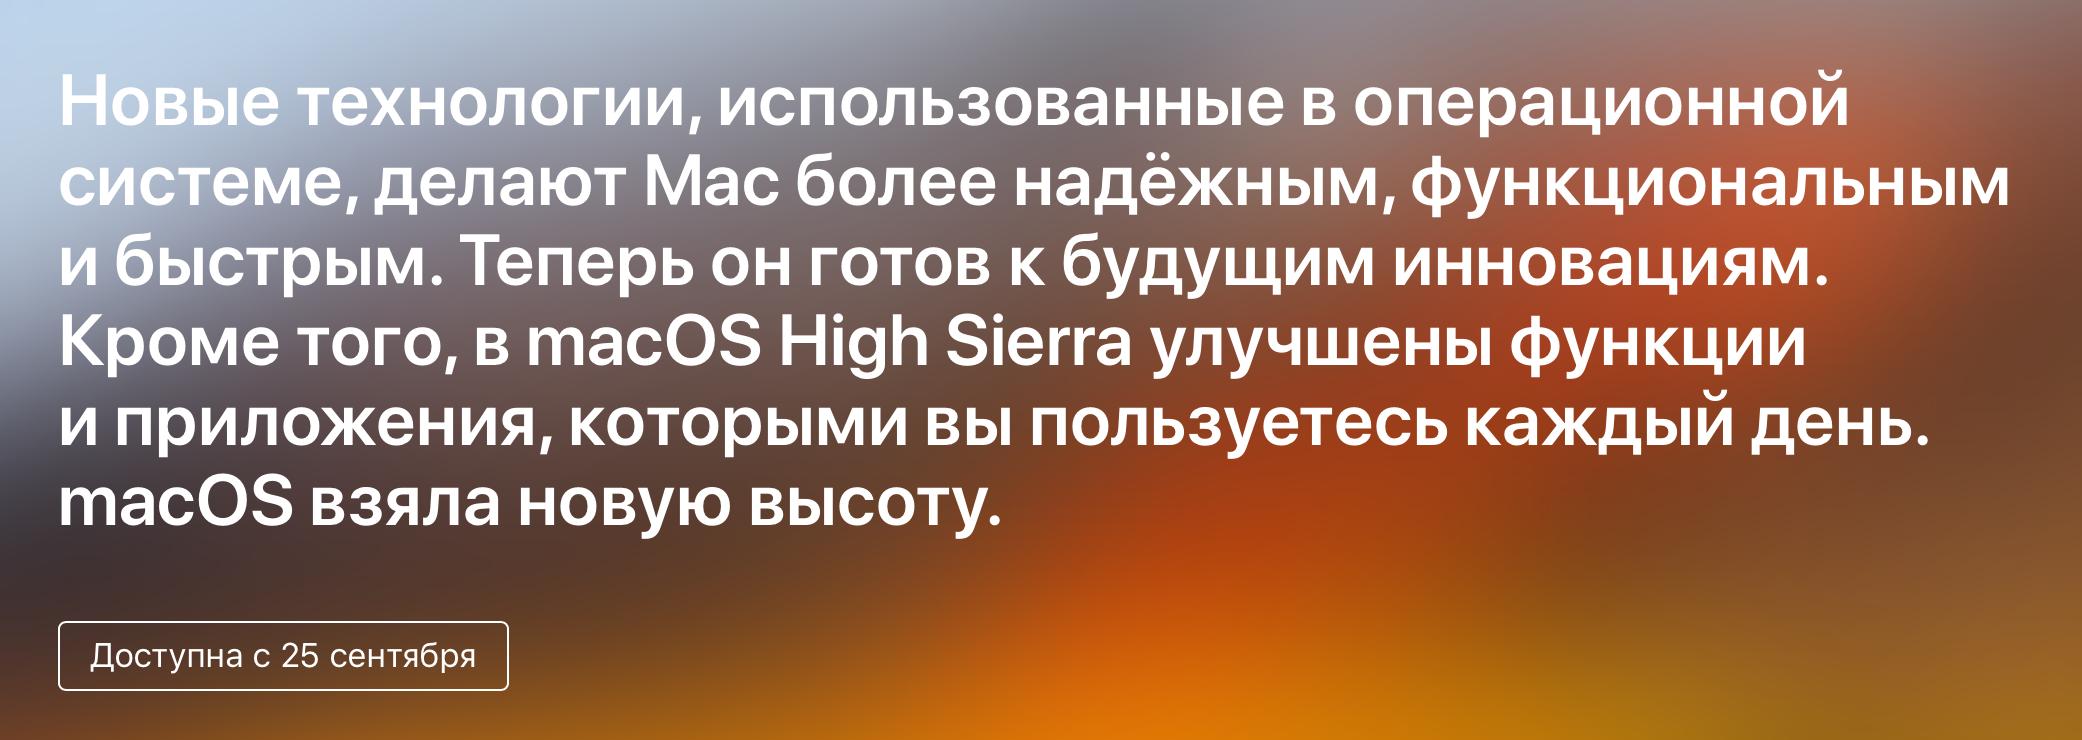 macOS High Sierra станет доступна 25 сентября